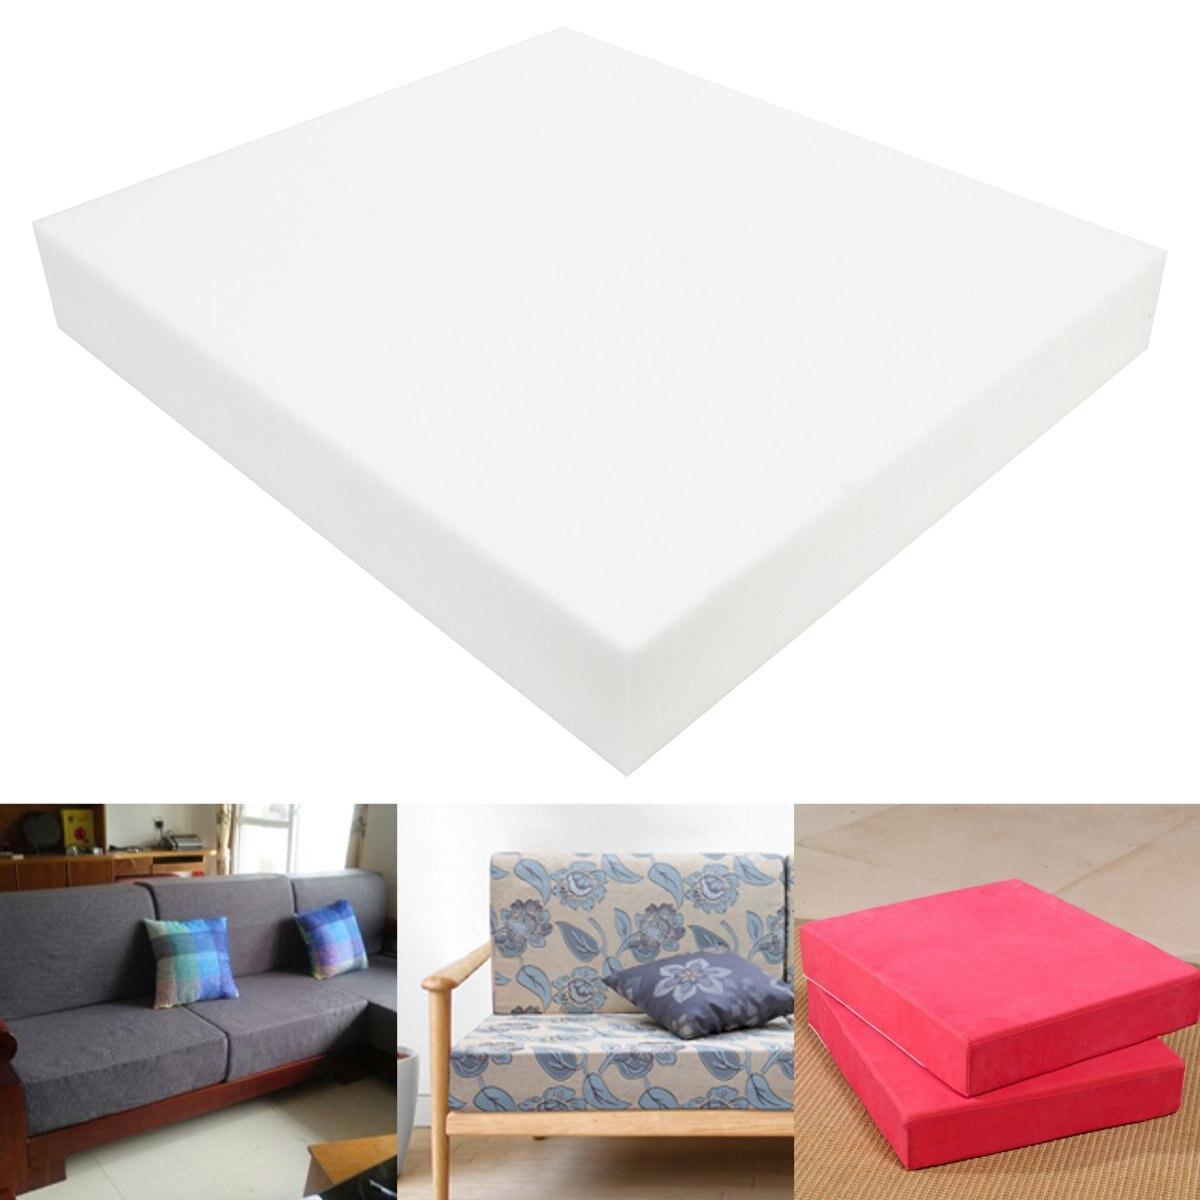 High Density Upholstery Cushion Foam Chair Sofa Seat Foam Pad